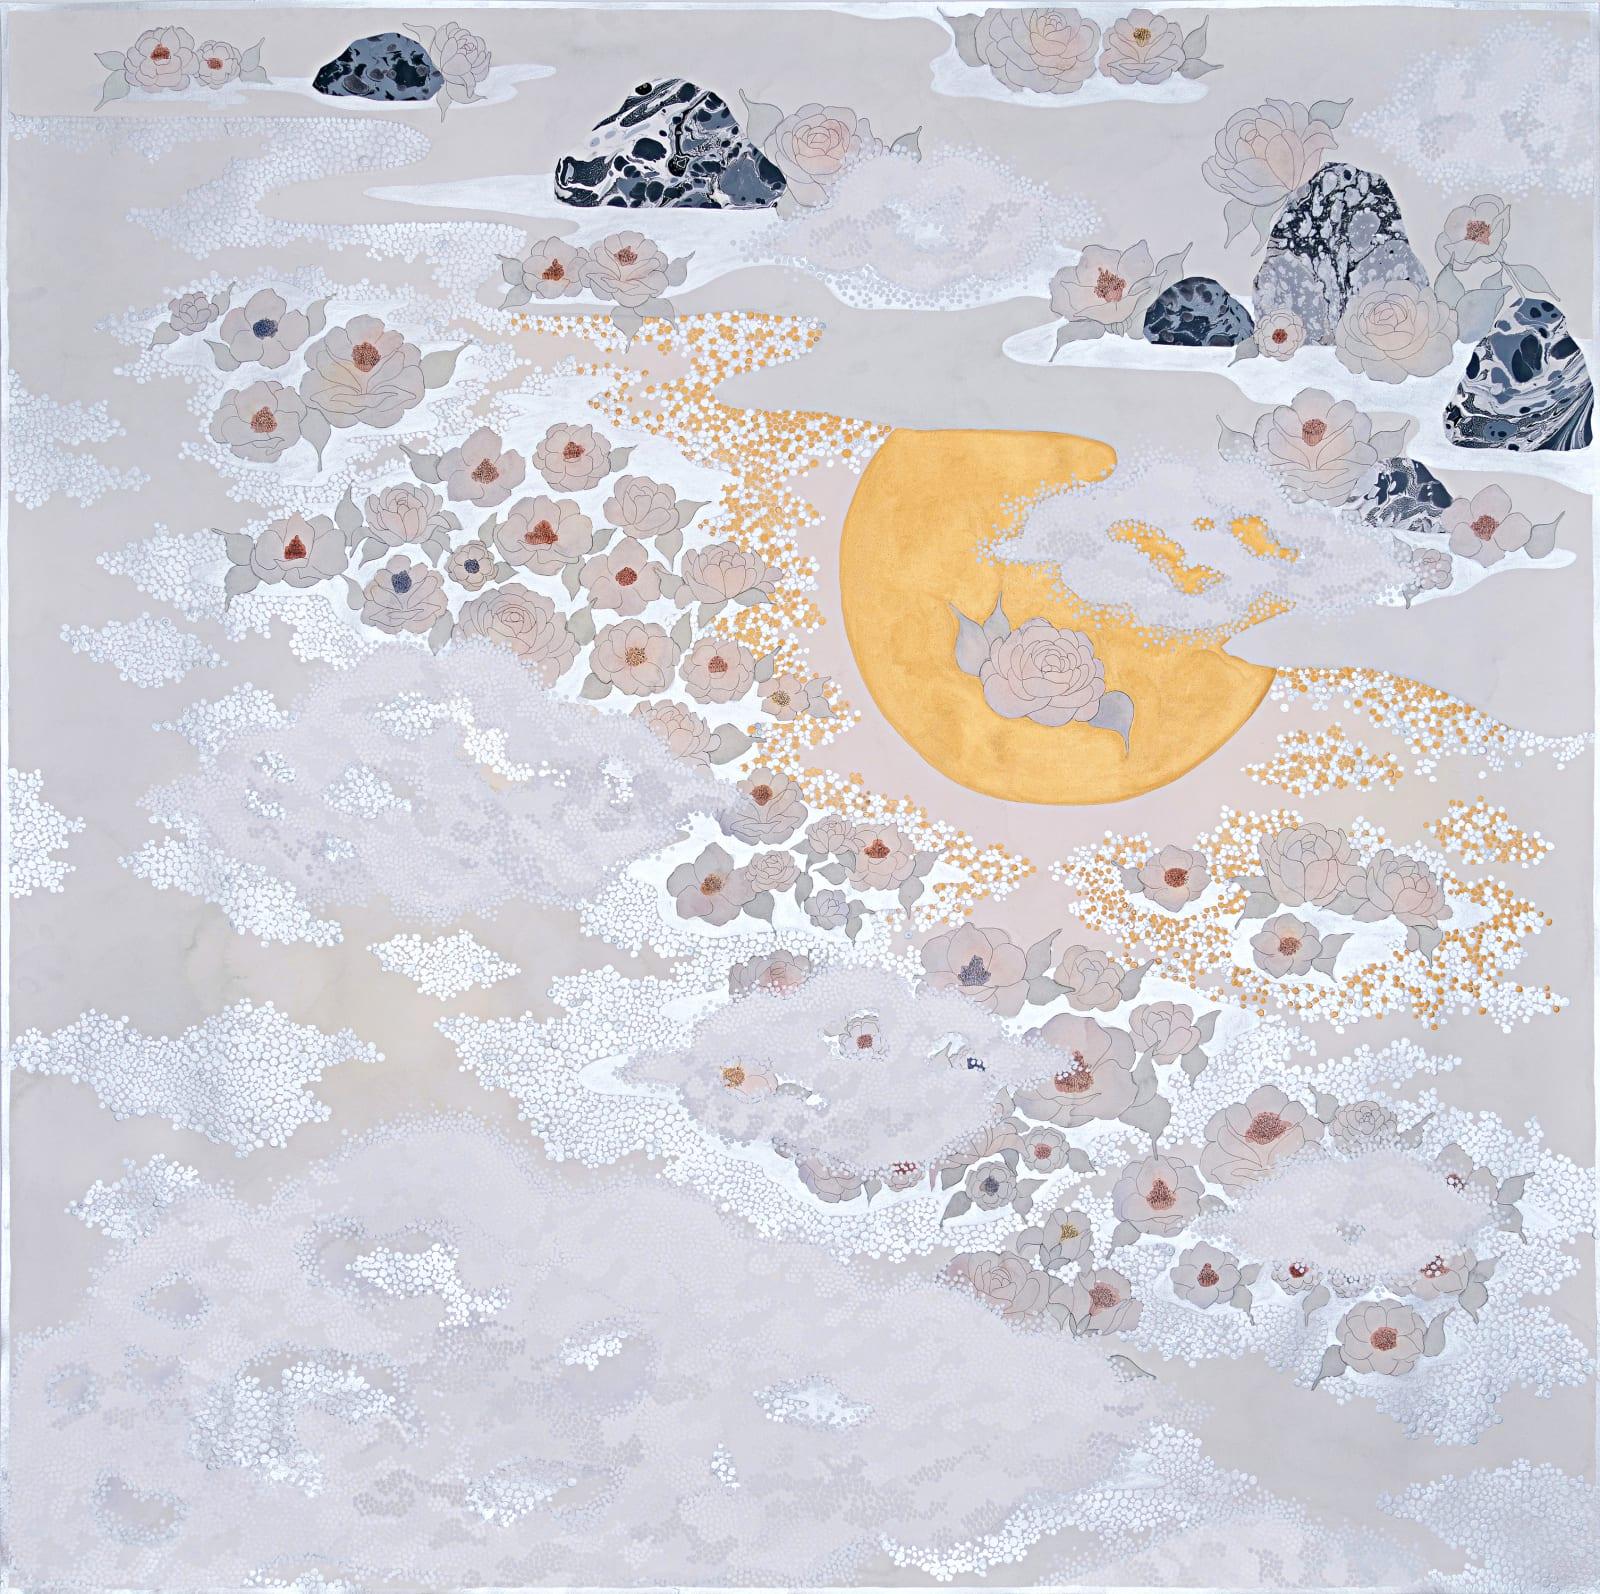 Crystal Liu, the fog, 'nestled', 2019